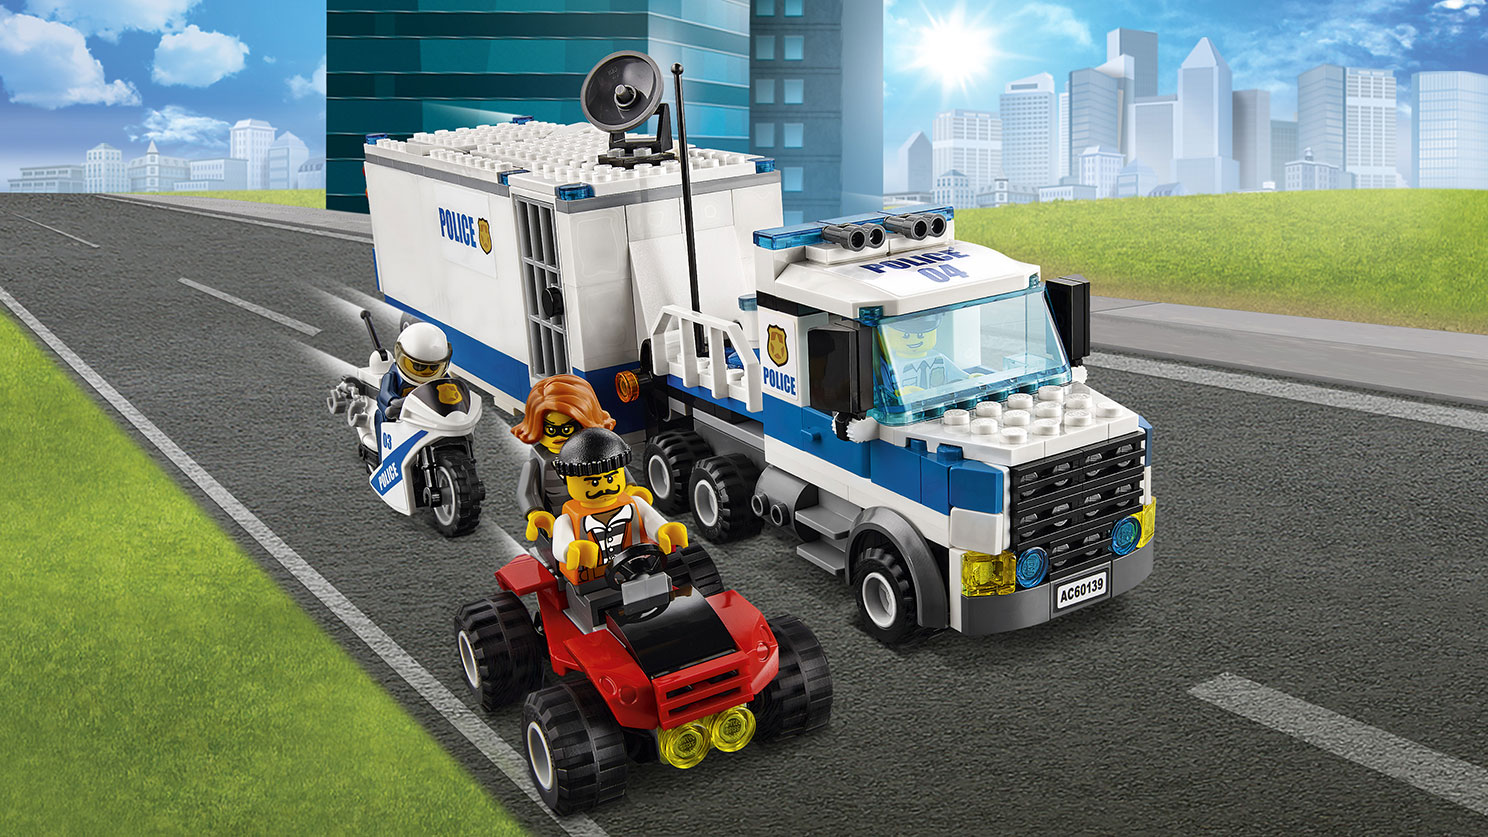 Лего сити картинки полиции